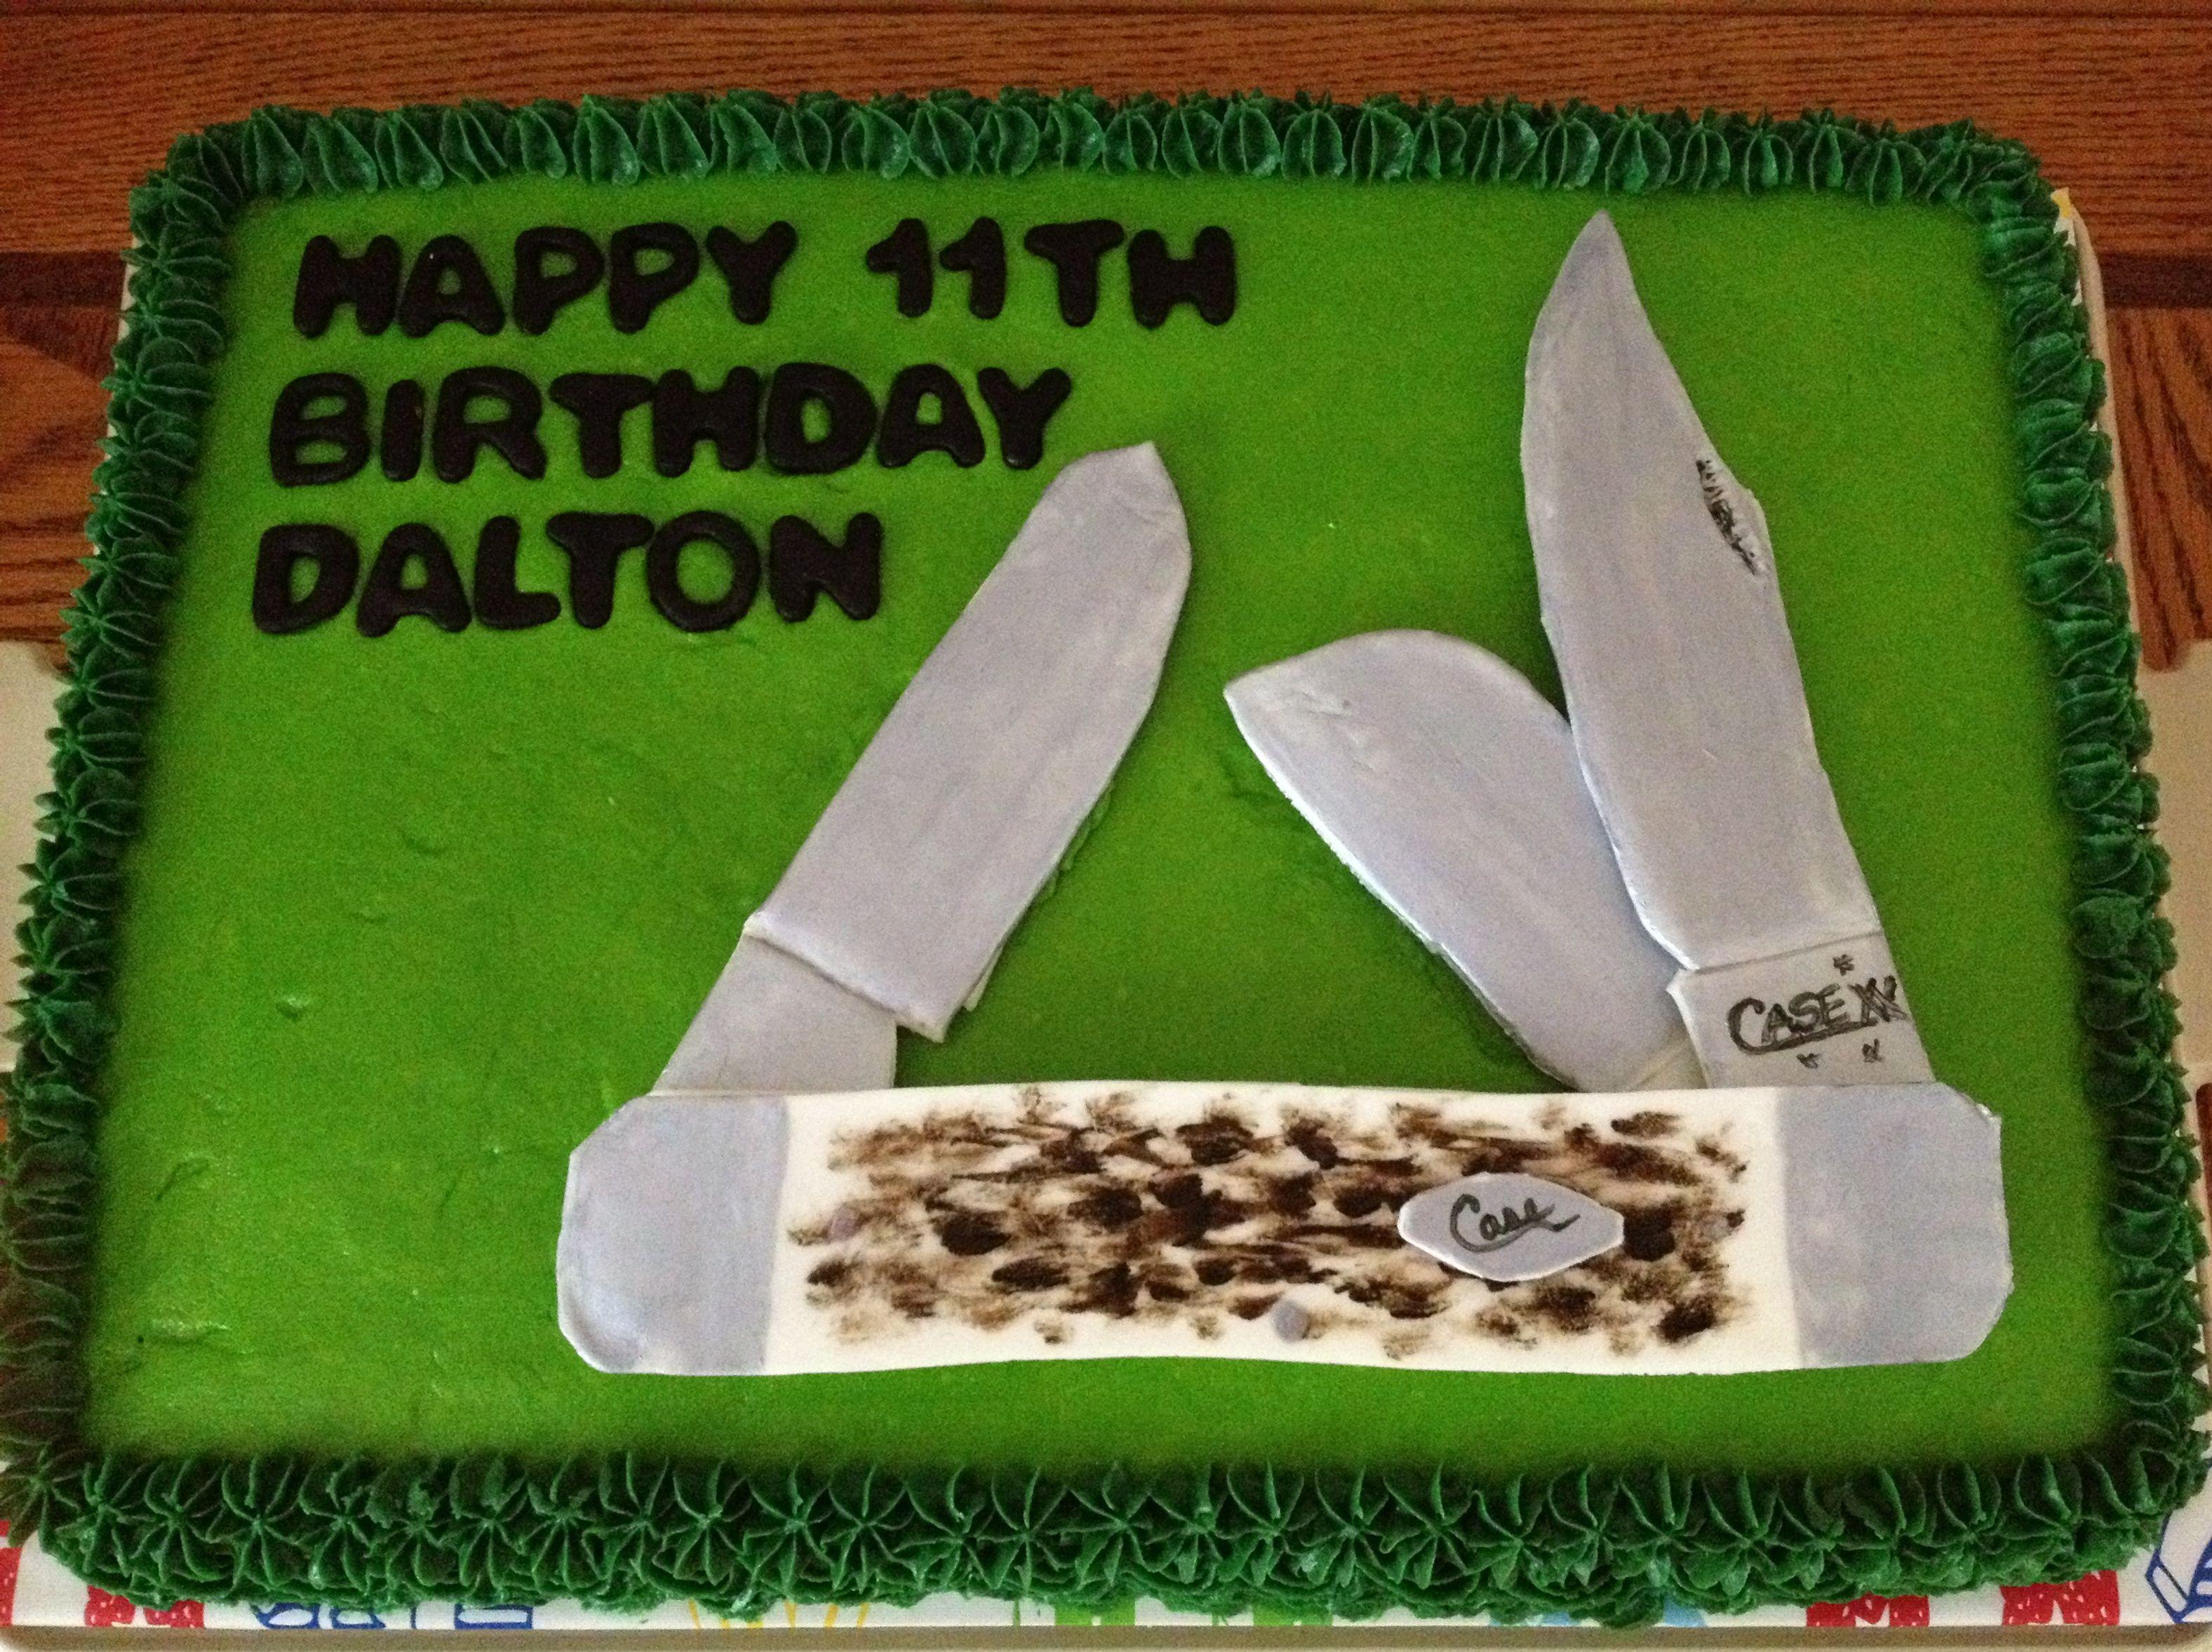 Case knife cake by graduation cakes case